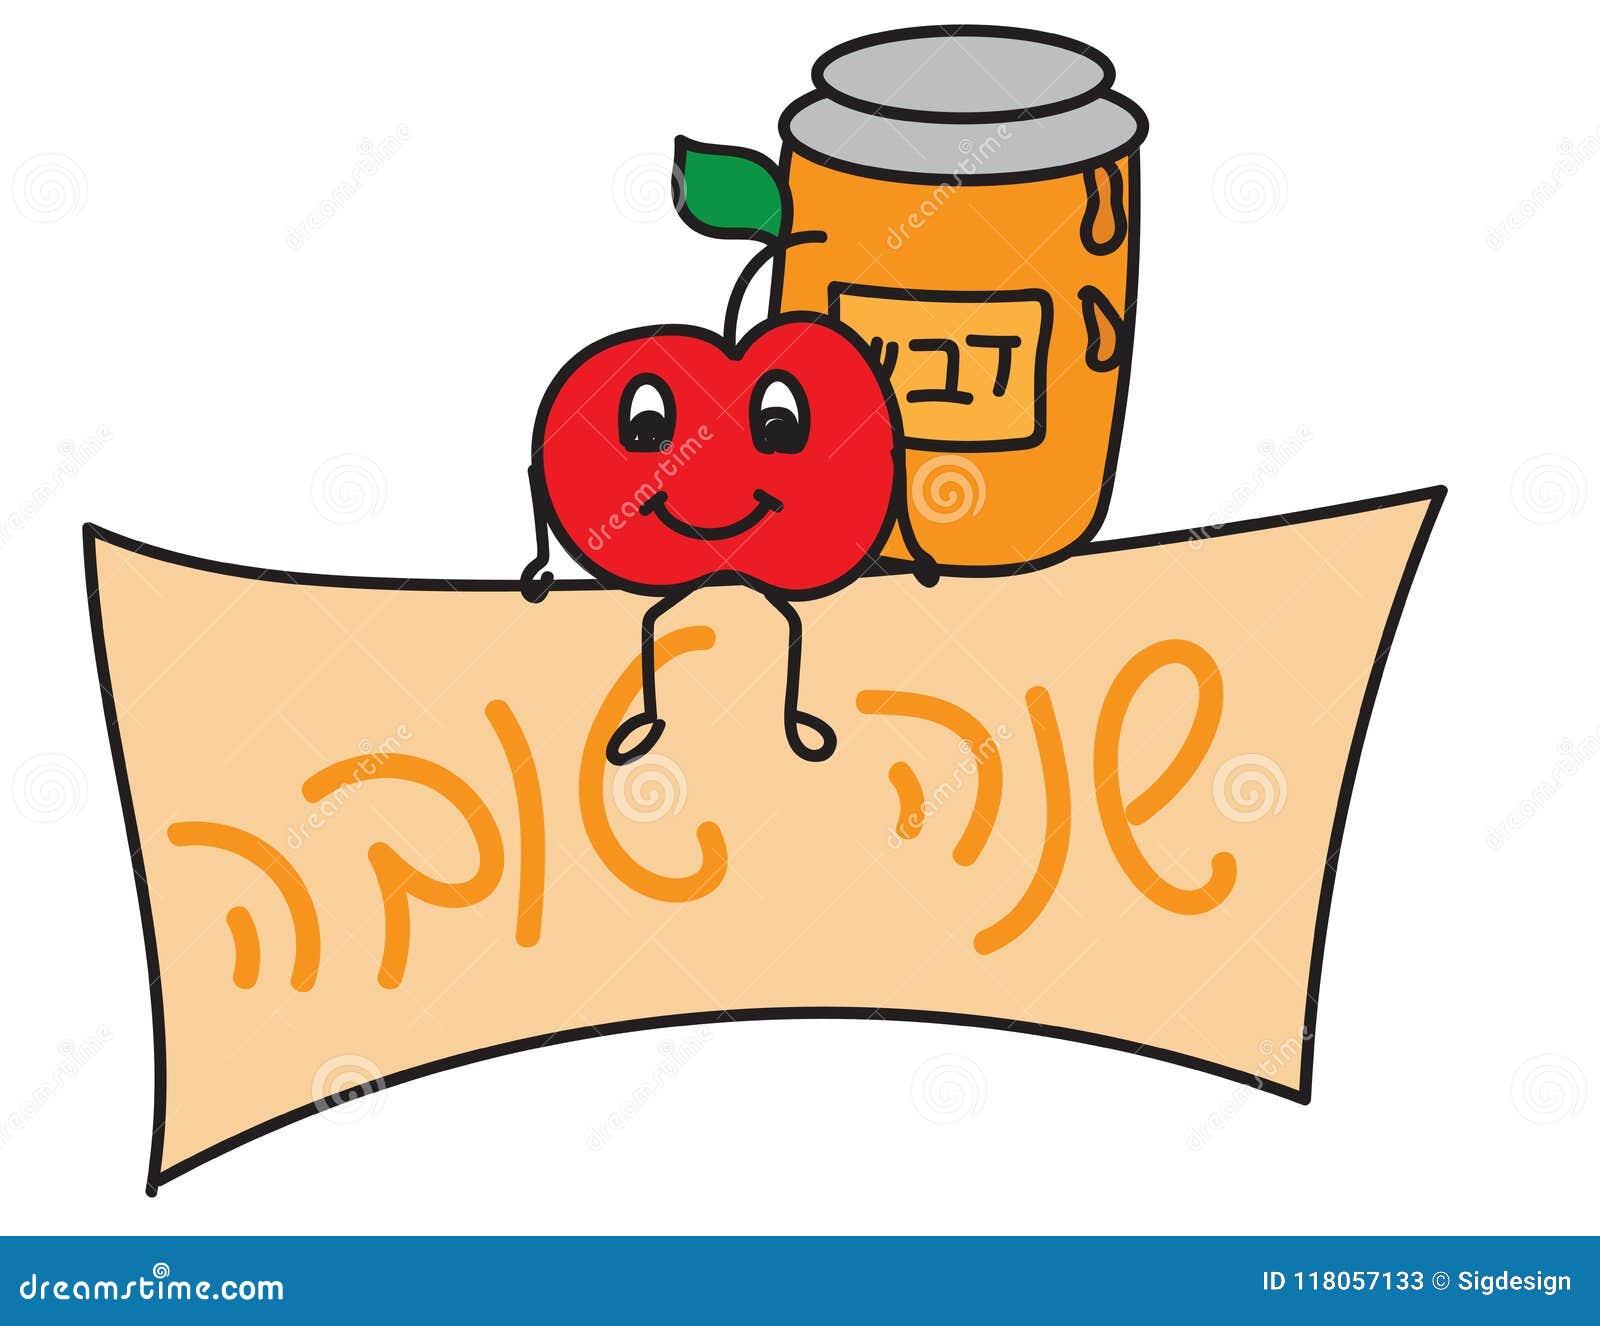 Rosh hashanah hebrew greeting card apple sitting on a banner stock download rosh hashanah hebrew greeting card apple sitting on a banner stock vector illustration m4hsunfo